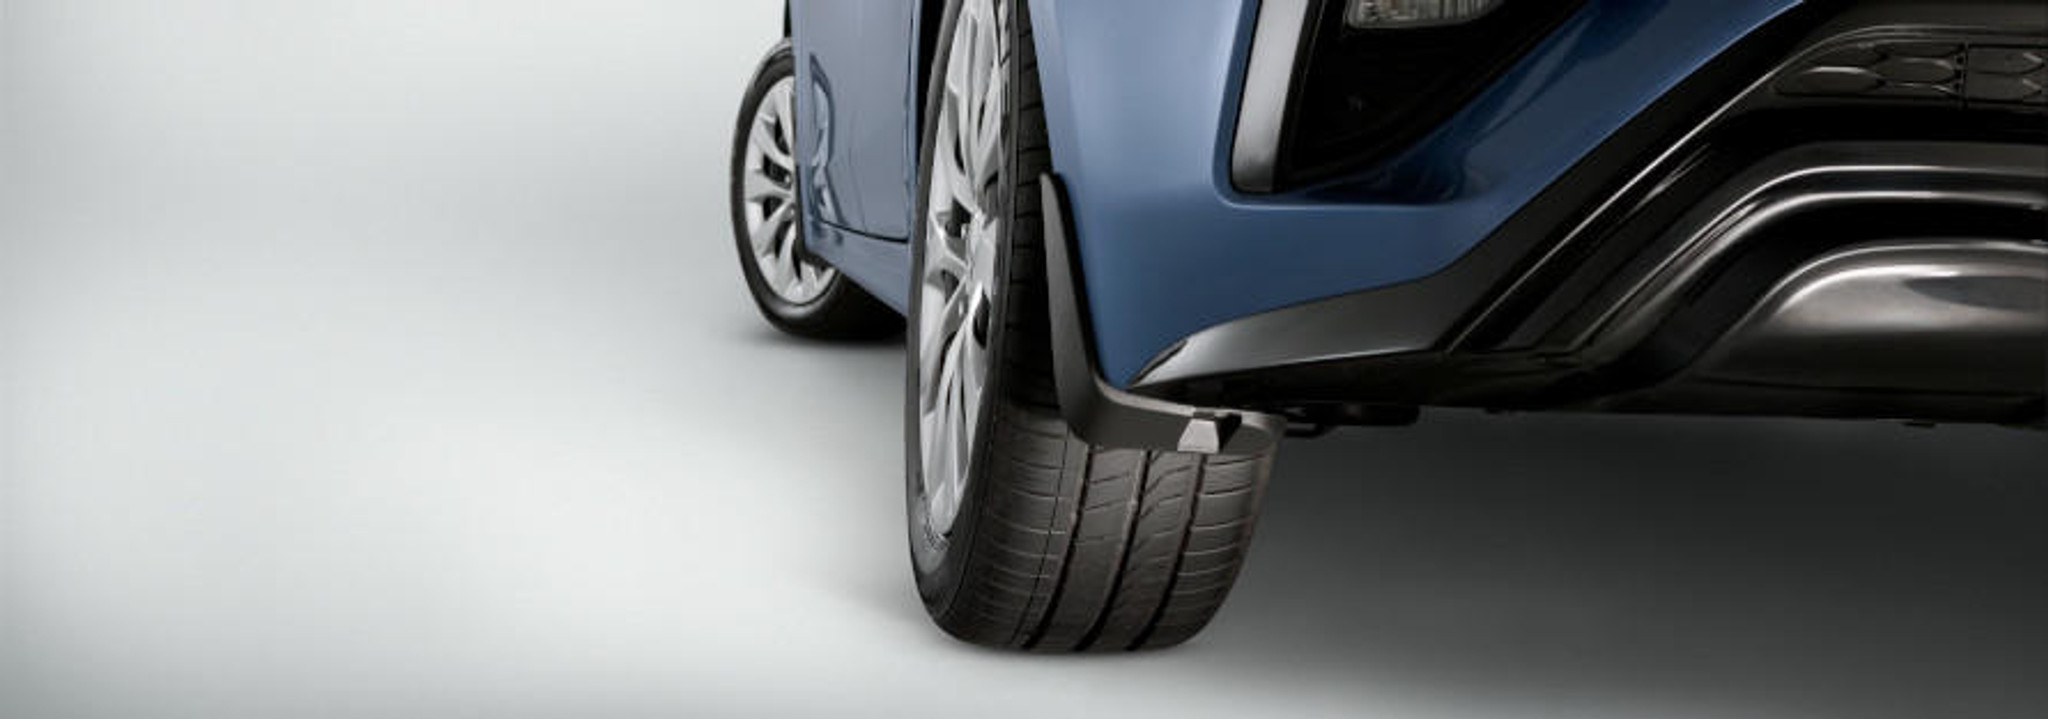 Sportage Ceed Performance Logo Car Mud Flap MudFlaps